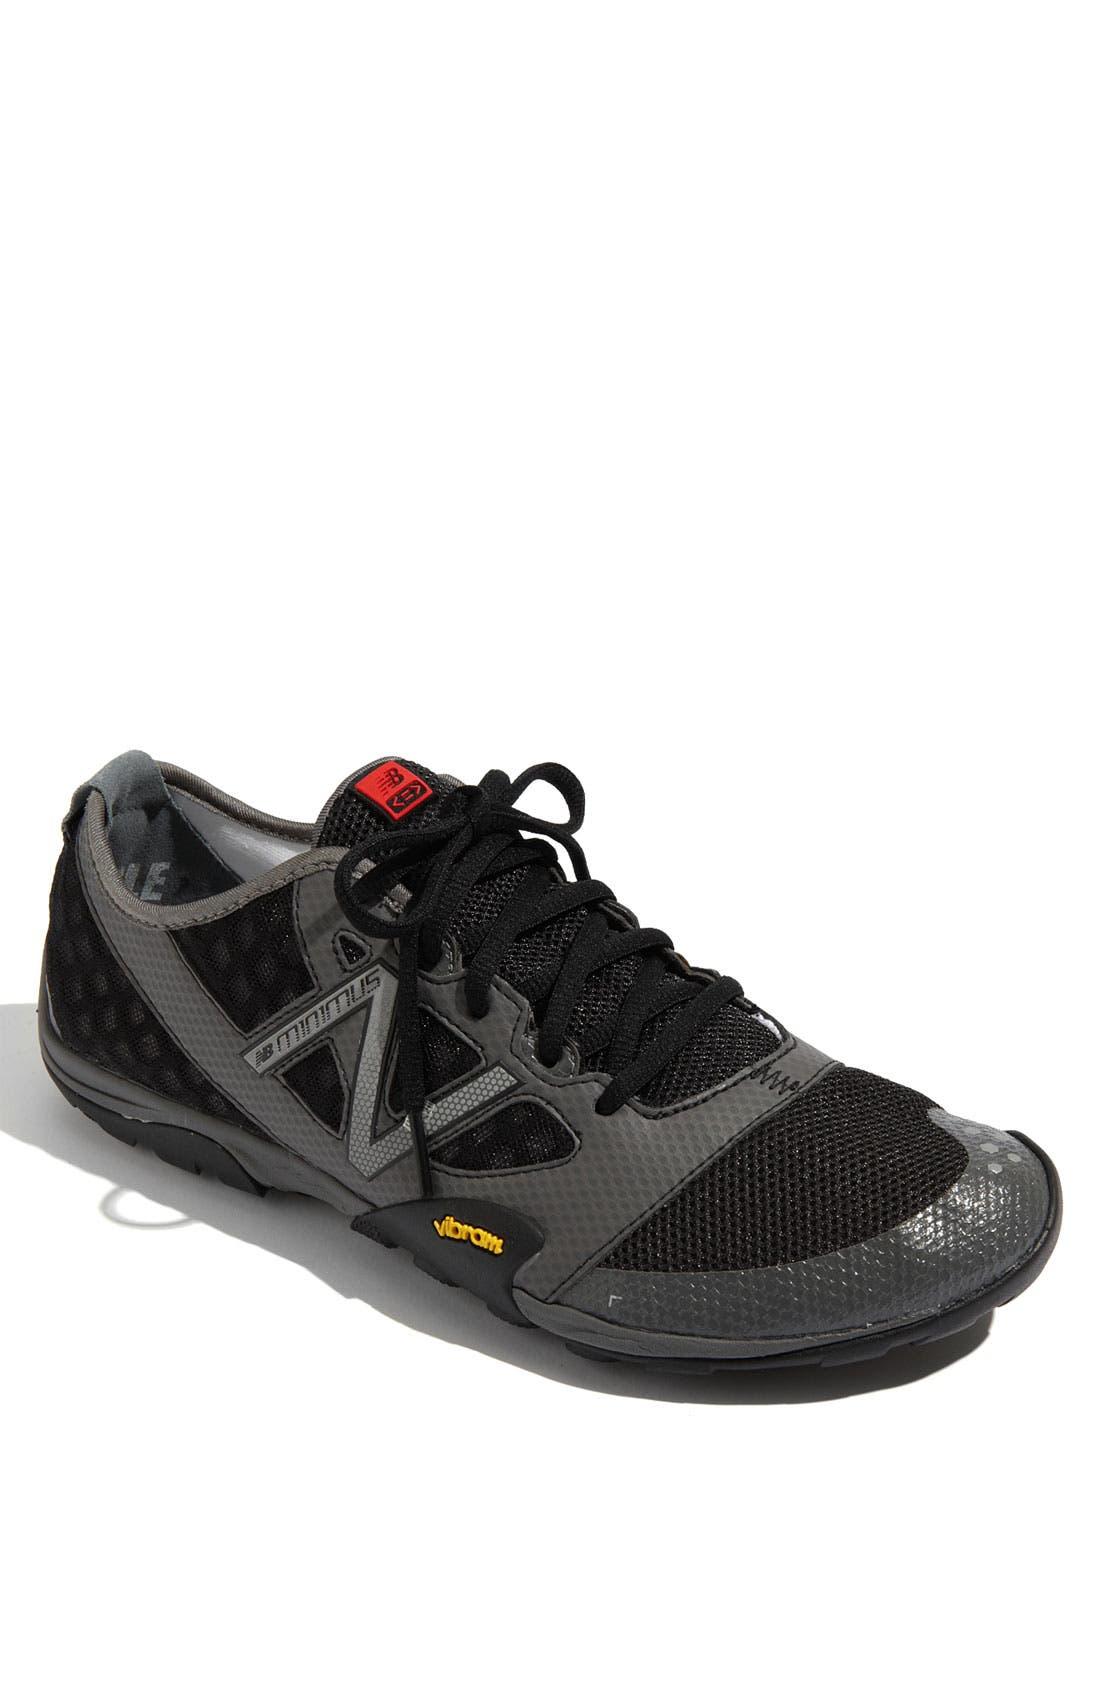 Alternate Image 1 Selected - New Balance 'MT 20 Minimus' Running Shoe (Men)